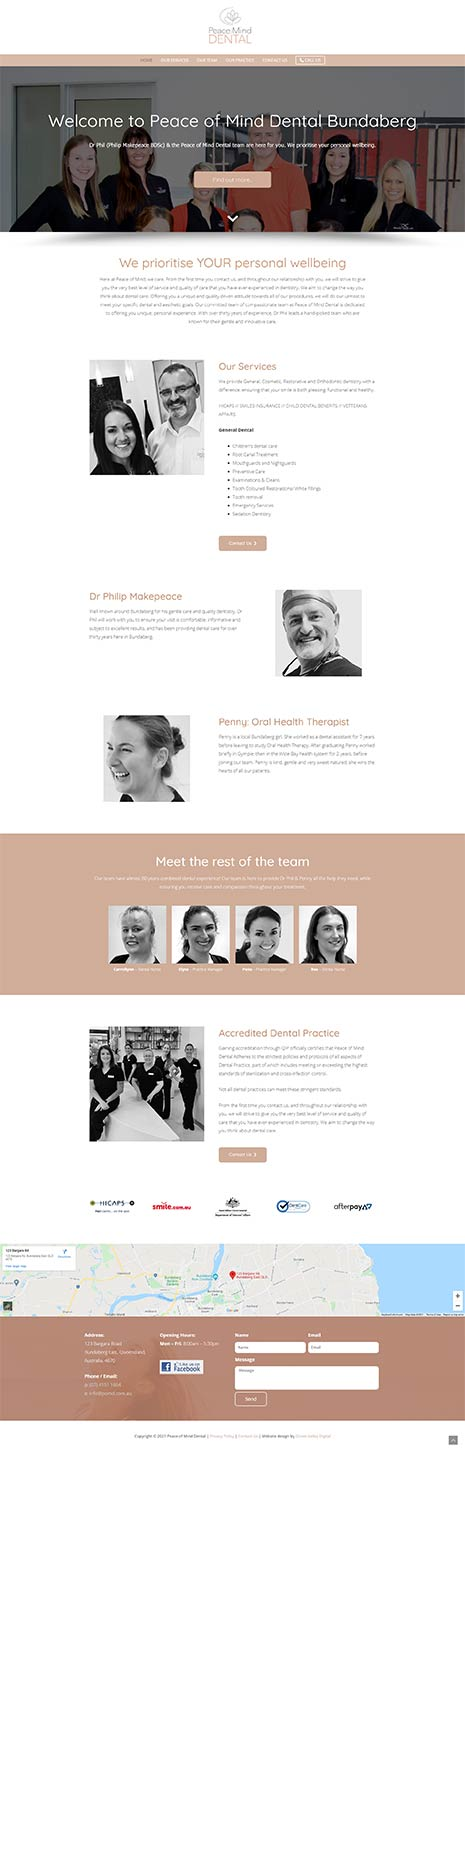 Peace of Mind Dentist - website